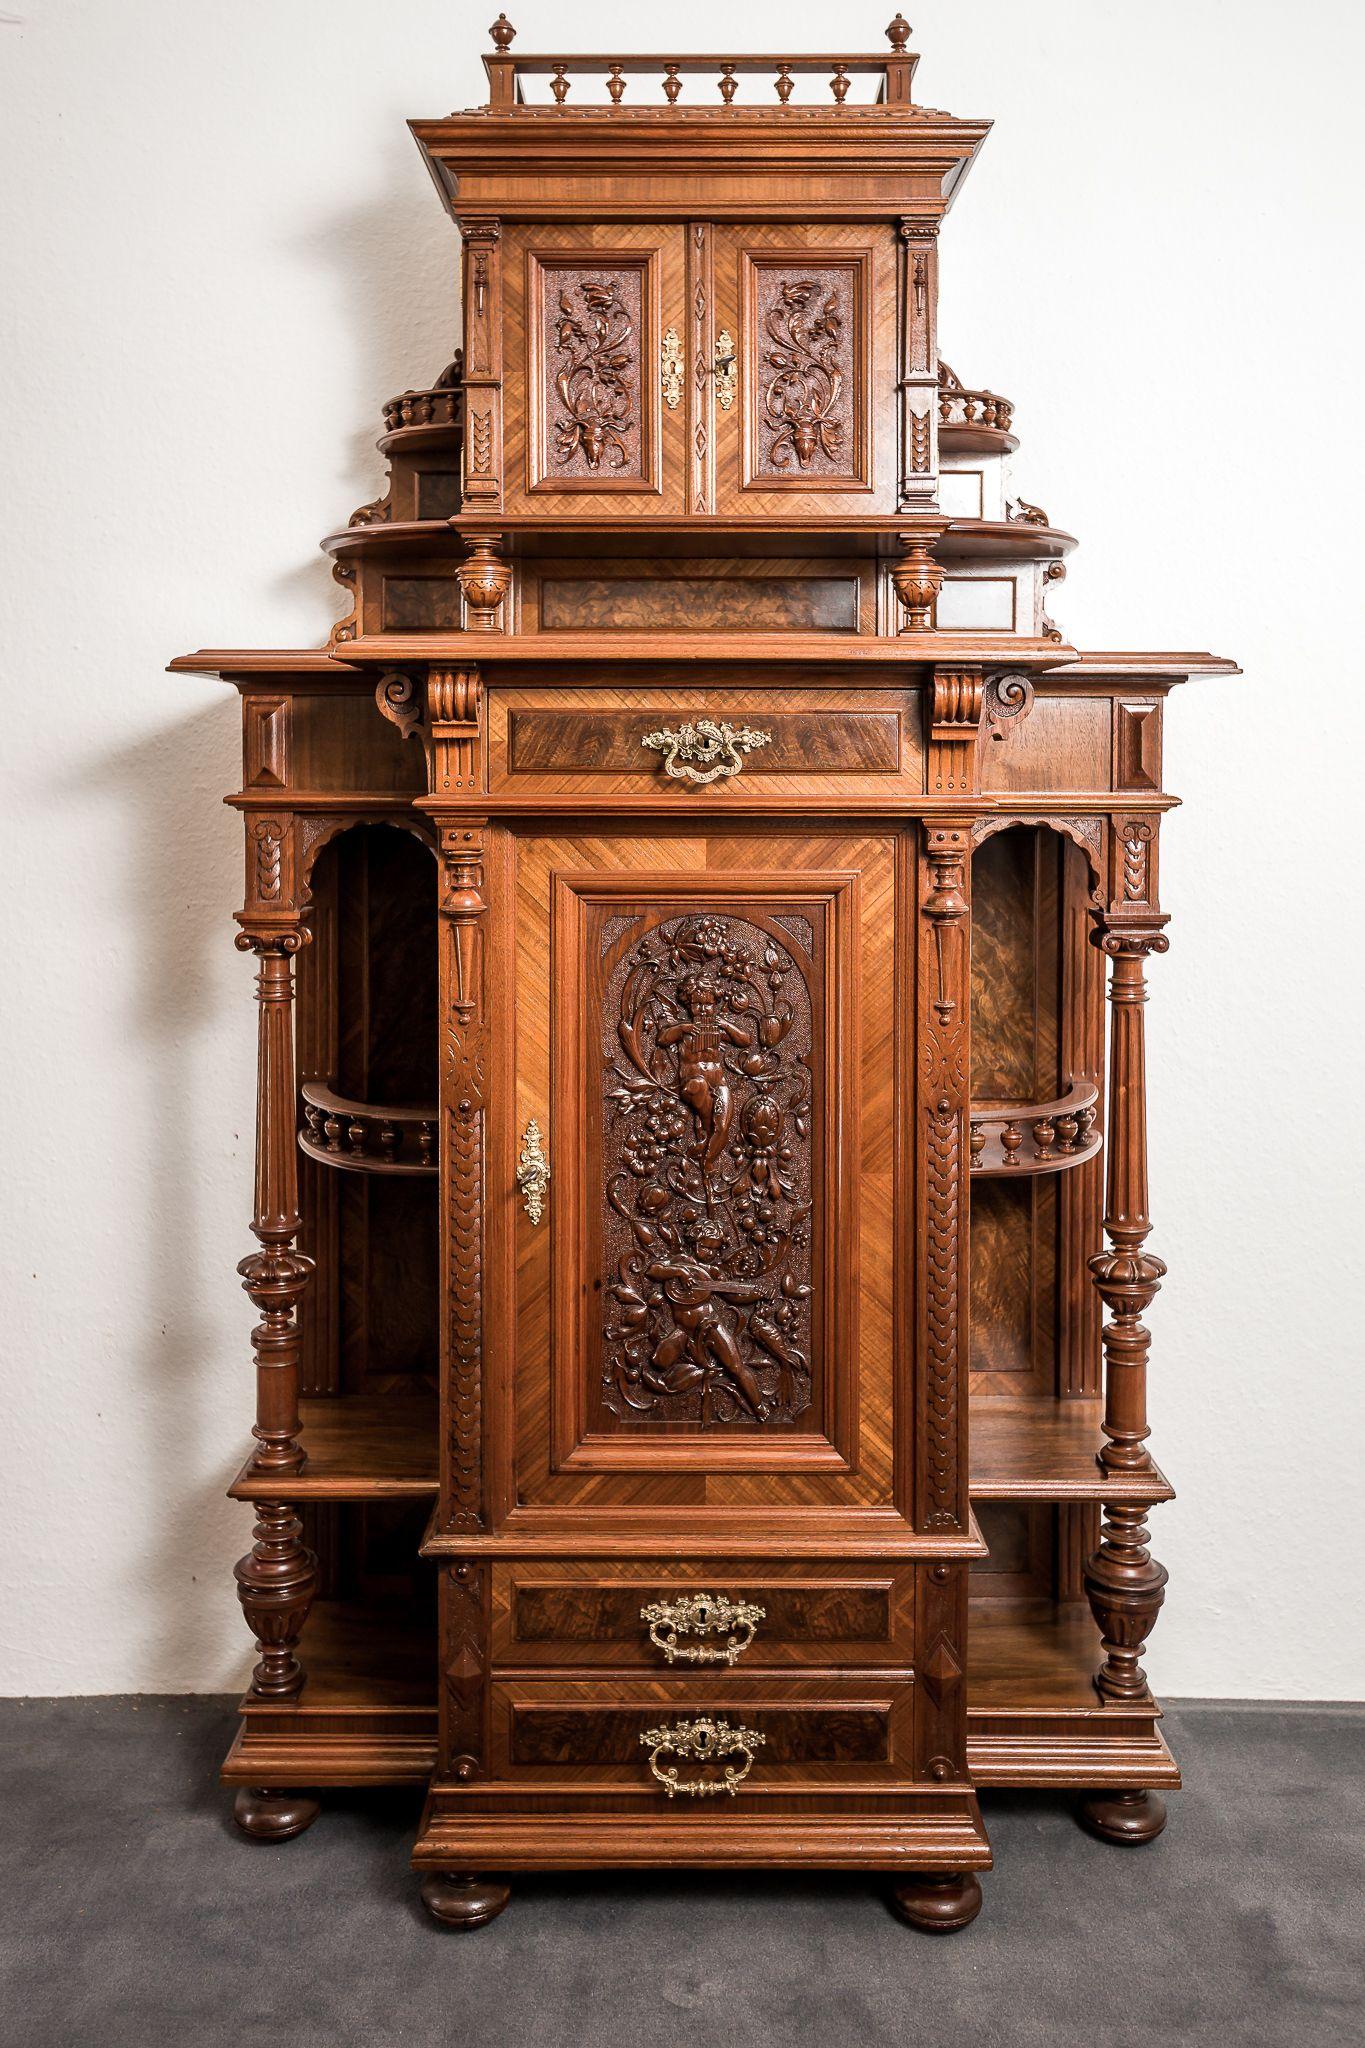 stefan r seler stilvolle gr nderzeit antiquit ten furniture pinterest gr nderzeit. Black Bedroom Furniture Sets. Home Design Ideas